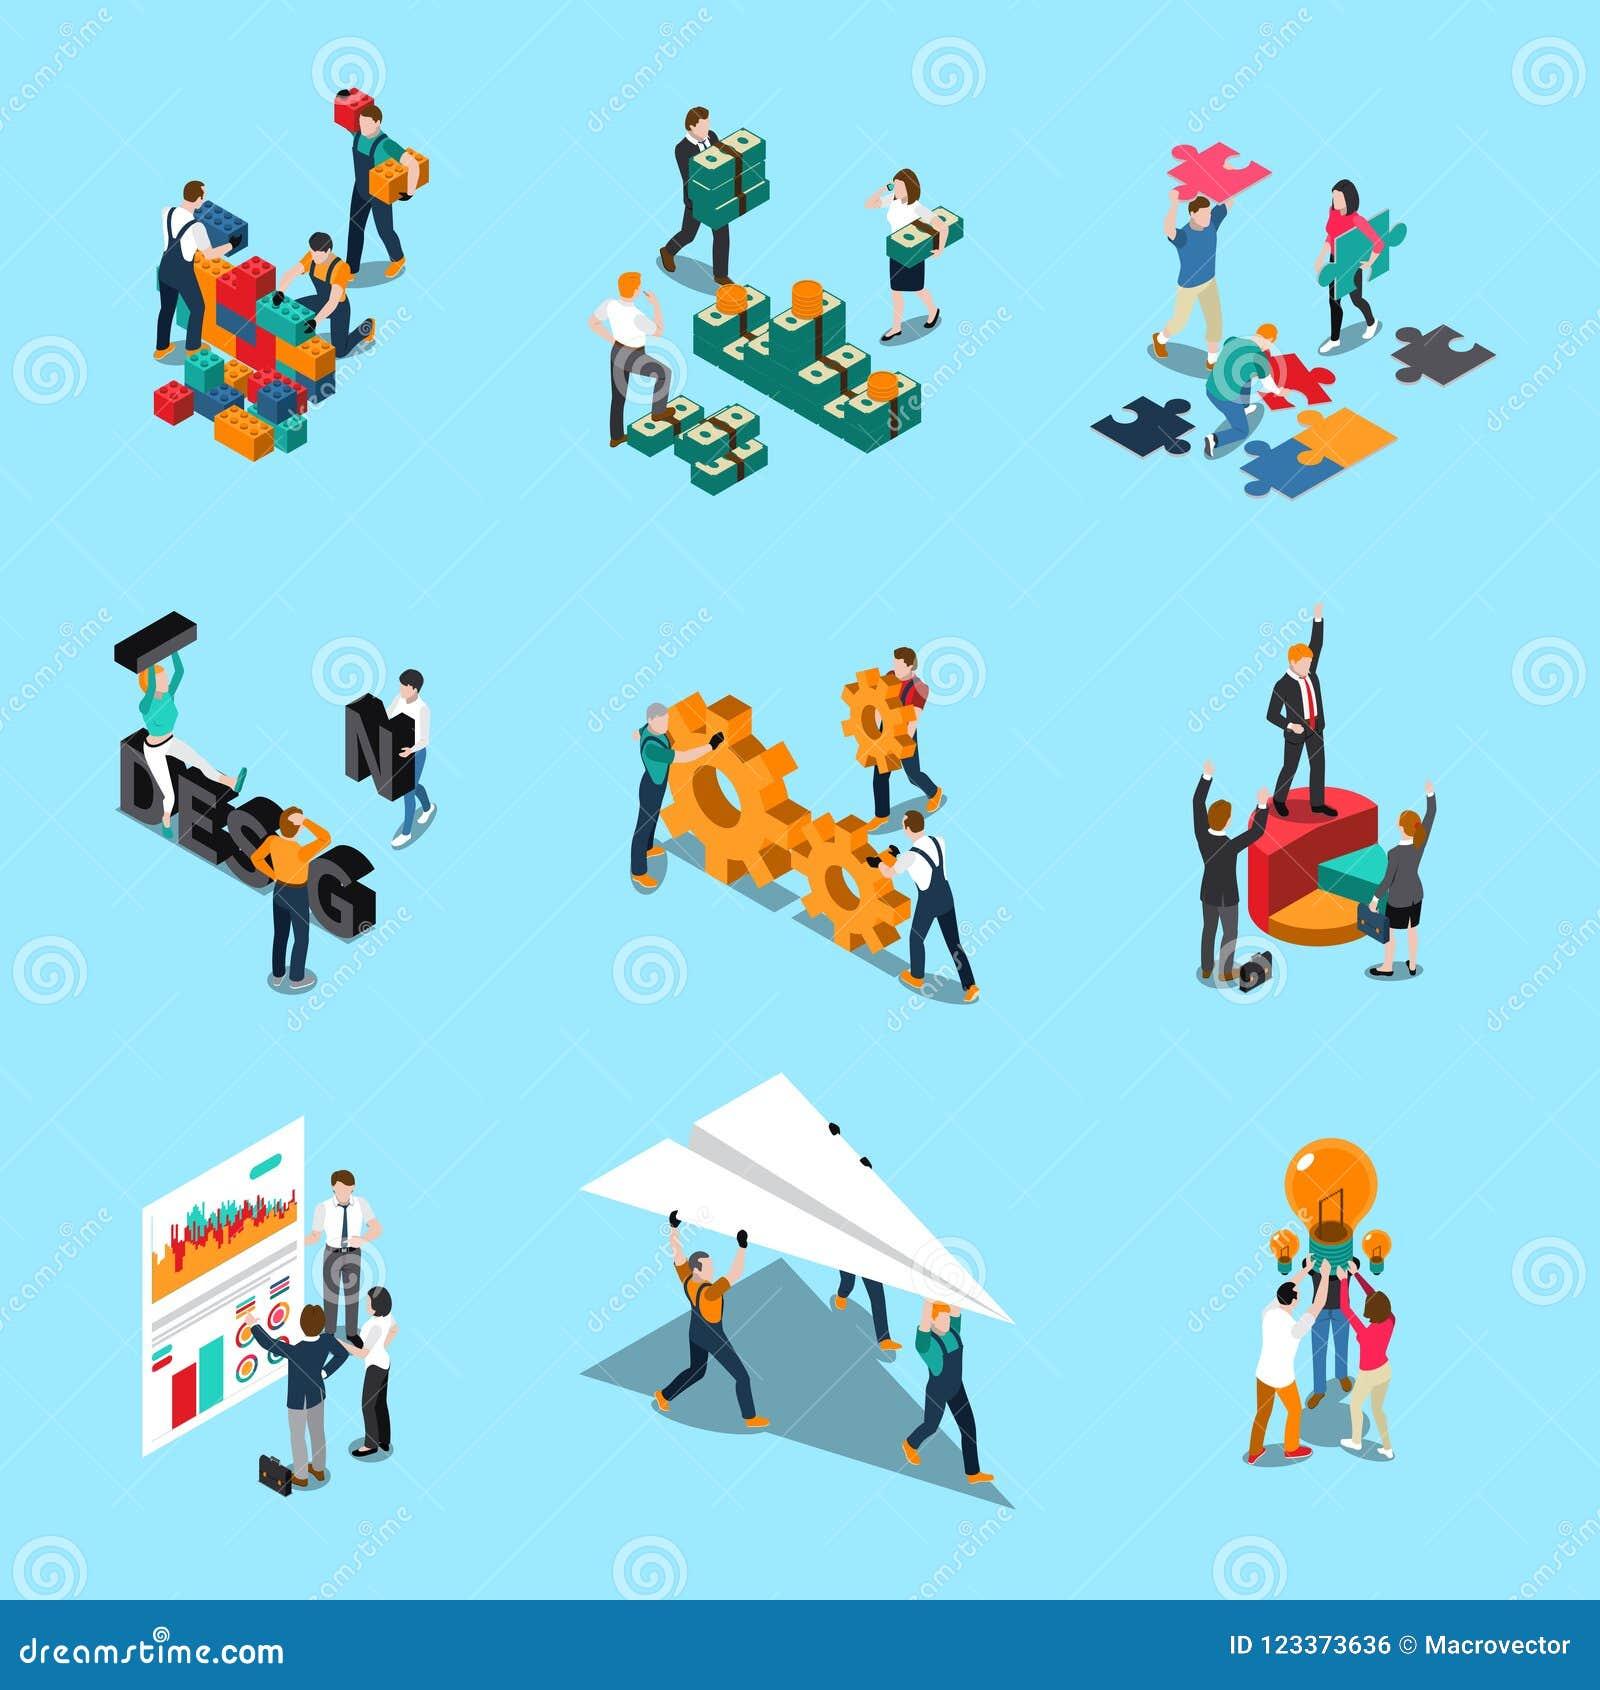 Teamwork Isometric Icons Set